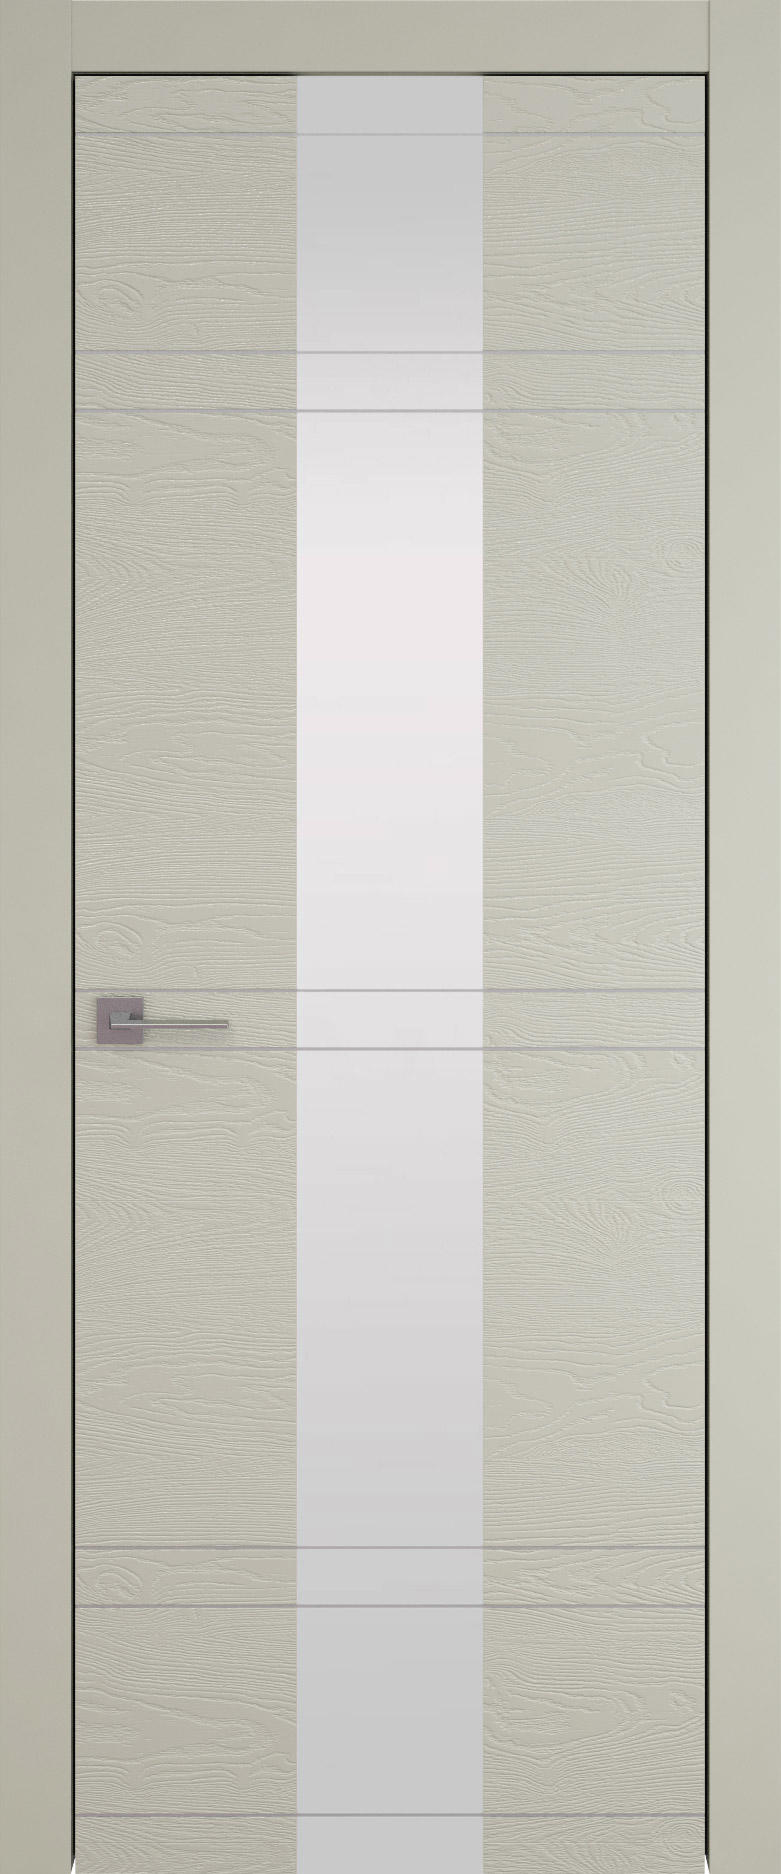 Tivoli Ж-4 цвет - Серо-оливковая эмаль по шпону (RAL 7032) Со стеклом (ДО)